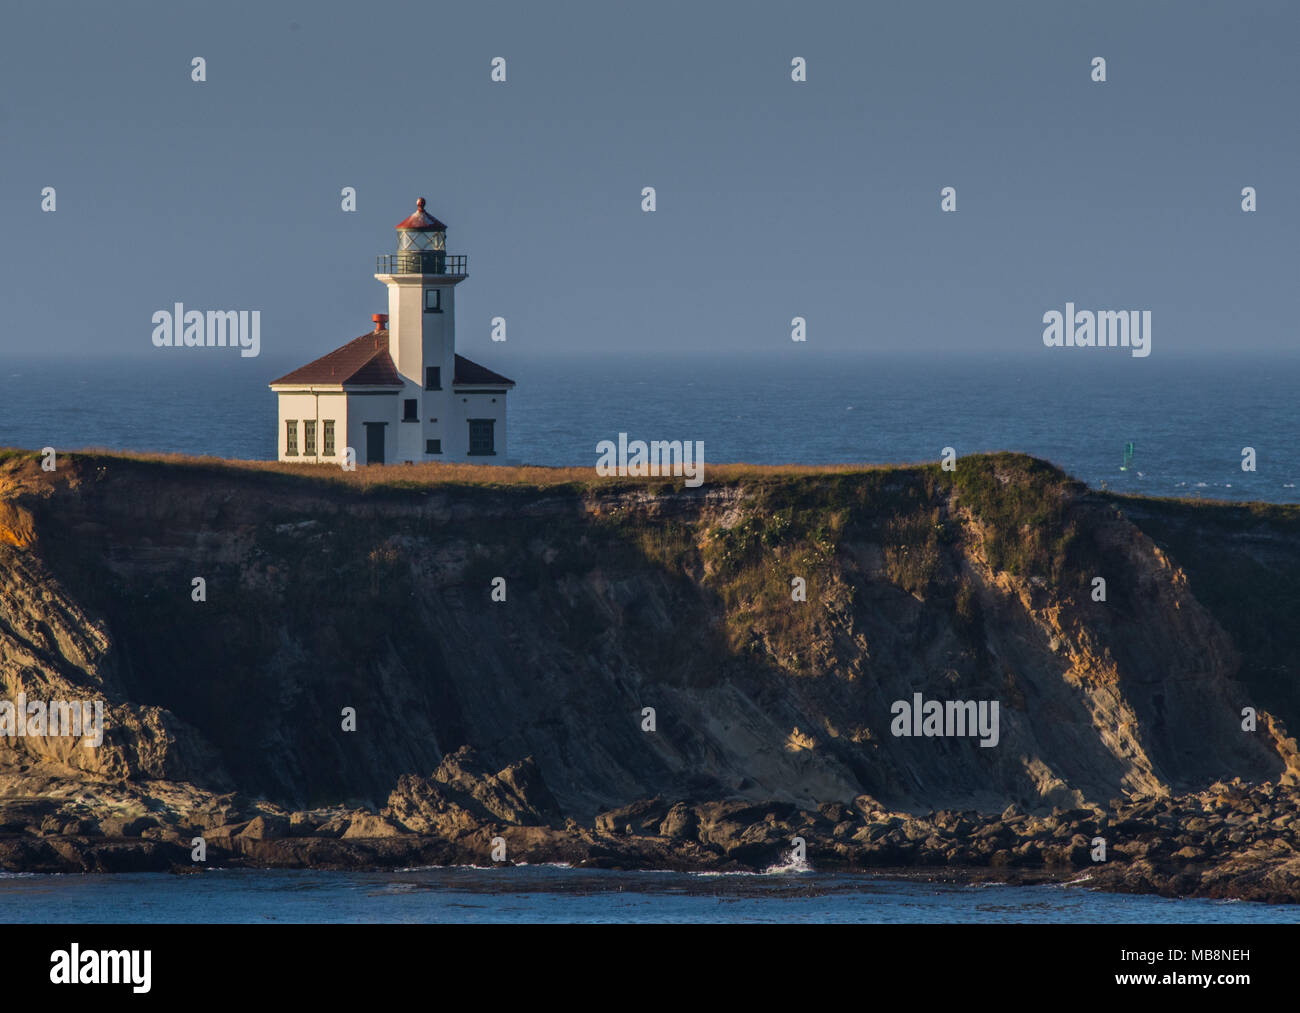 Cape Arago Lighthouse Perched Atop a Cliff Along the Oregon Coast - Stock Image